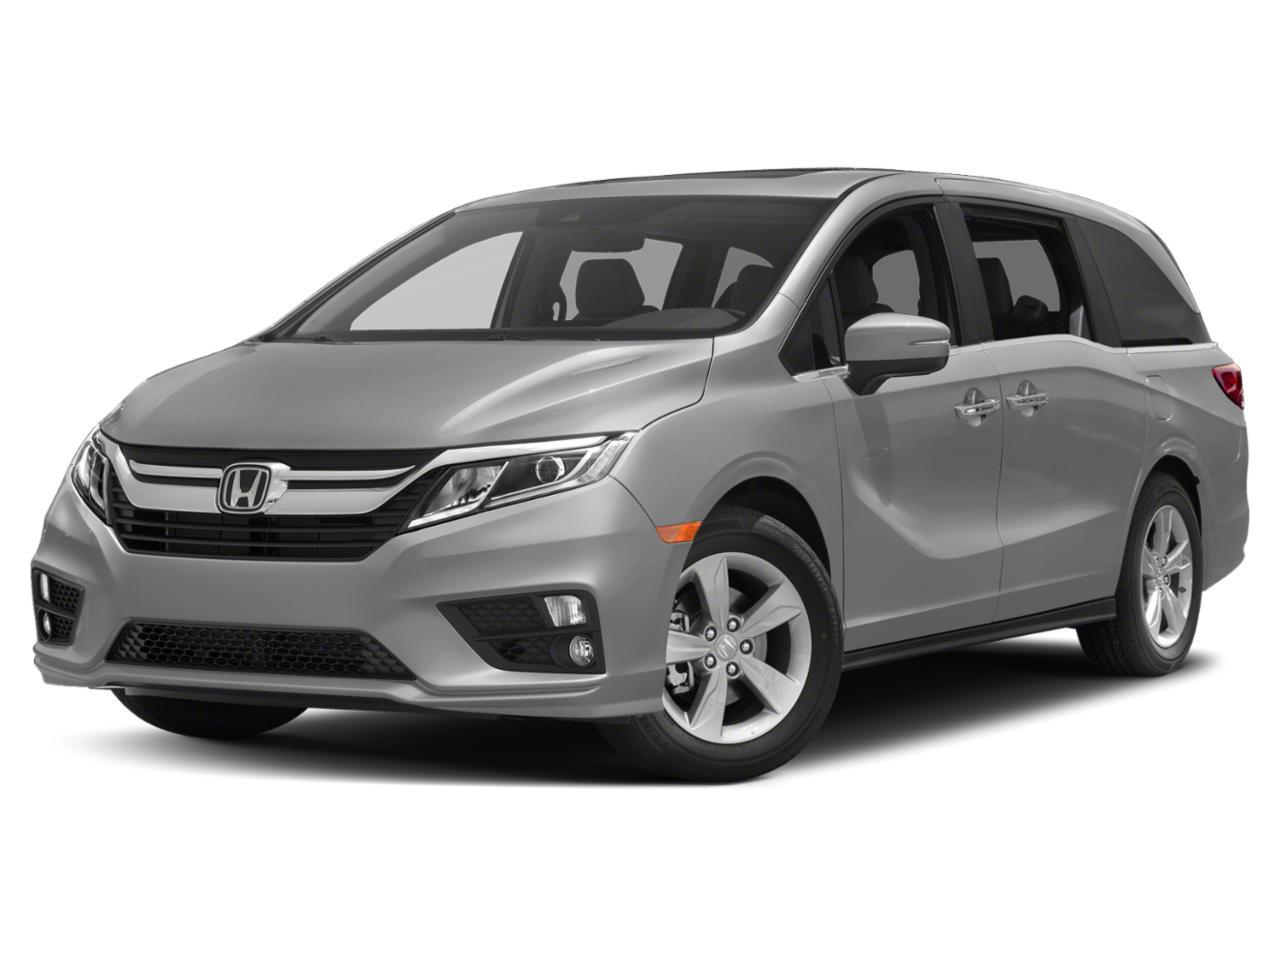 2018 Honda Odyssey Vehicle Photo in San Antonio, TX 78238